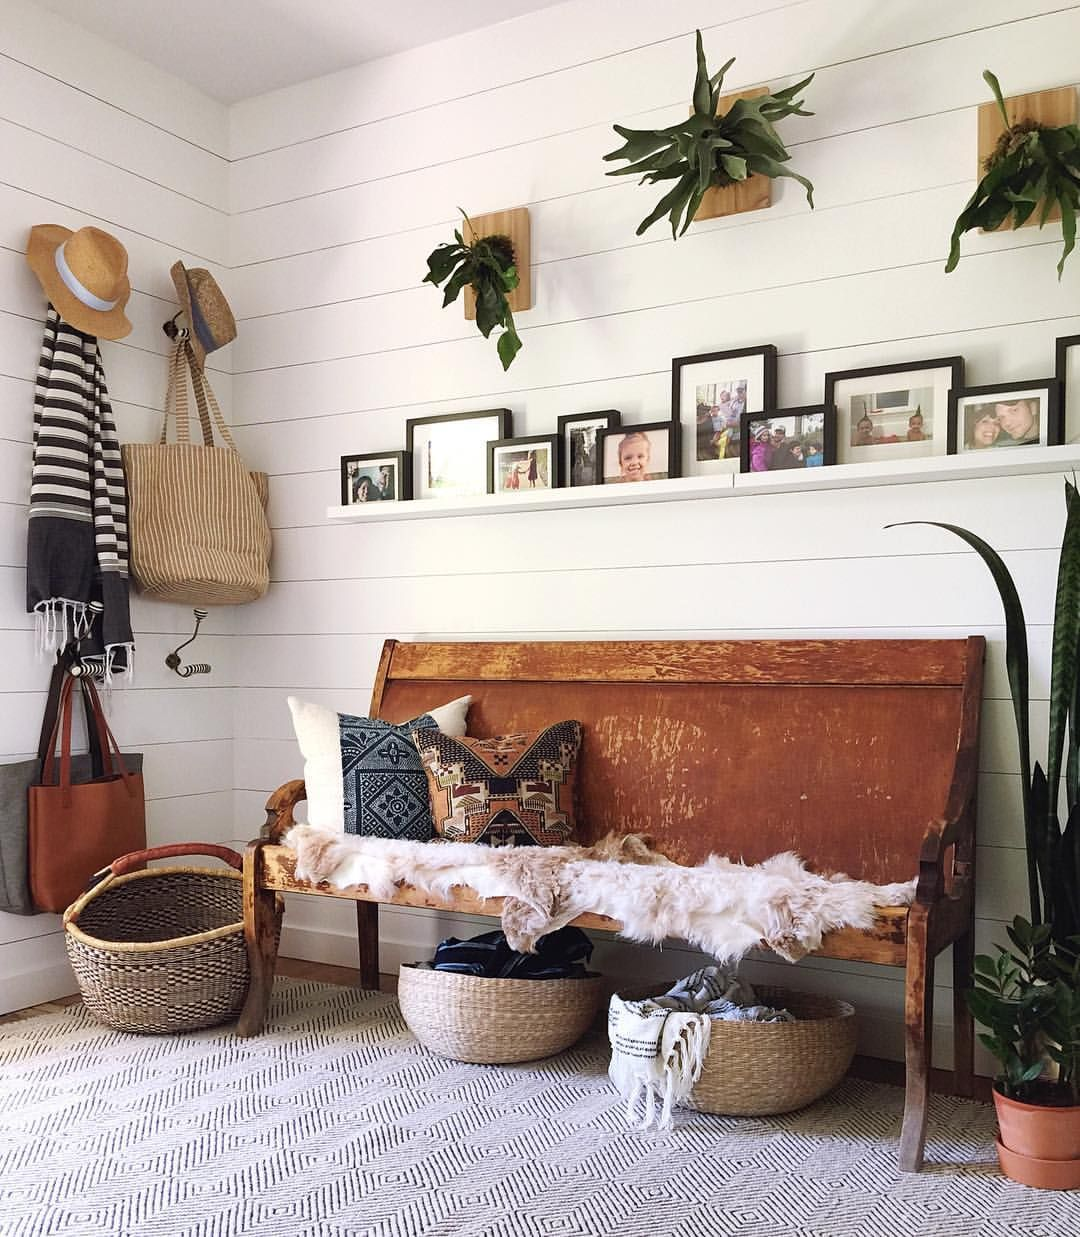 Modern bohemian home decor   Likes  Comments  Megan Schlachtenhaufen undecoratedhome